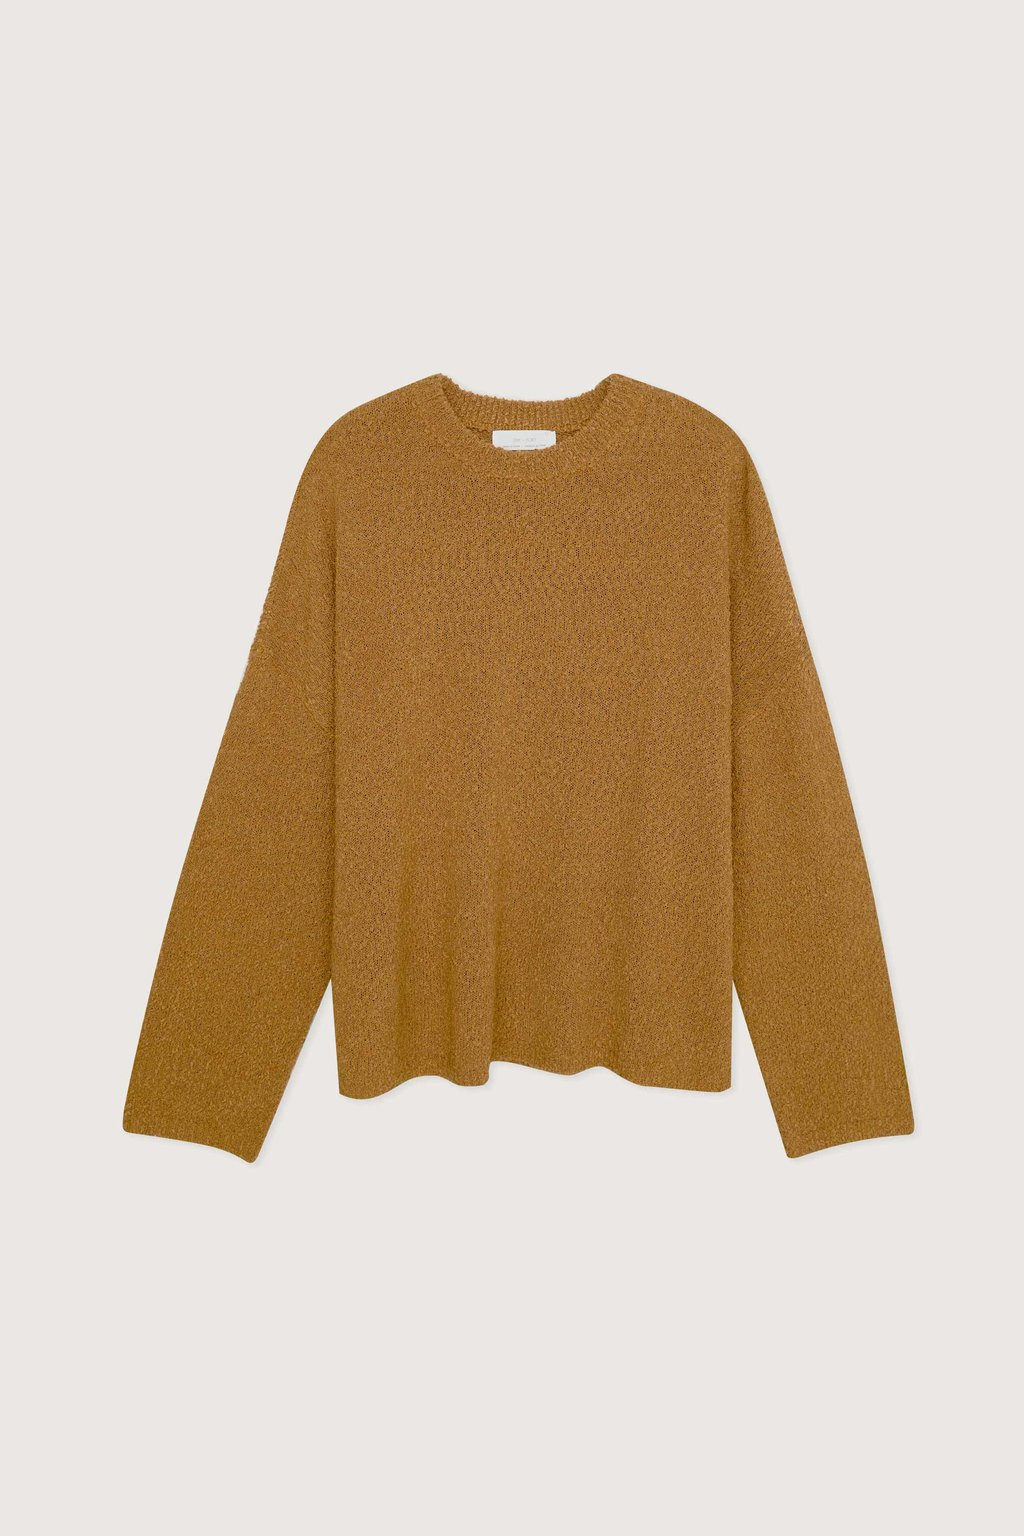 Sweater 3376 Mustard 5